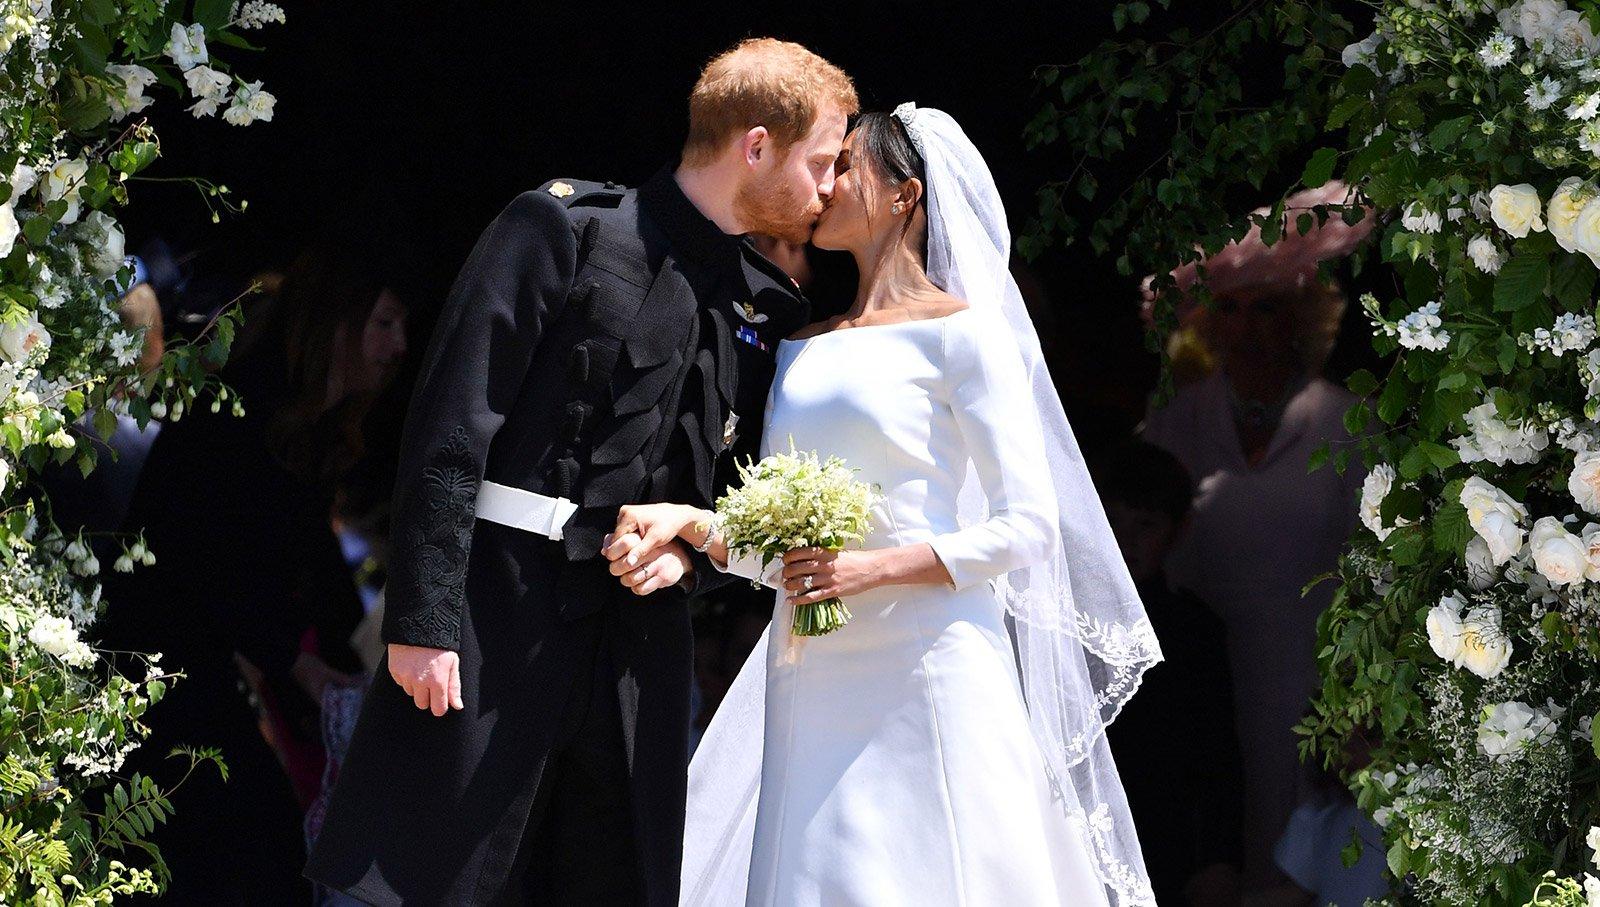 KOD, KKD And Menaye Donkor Dress Up For Royal Wedding Celebrations ...